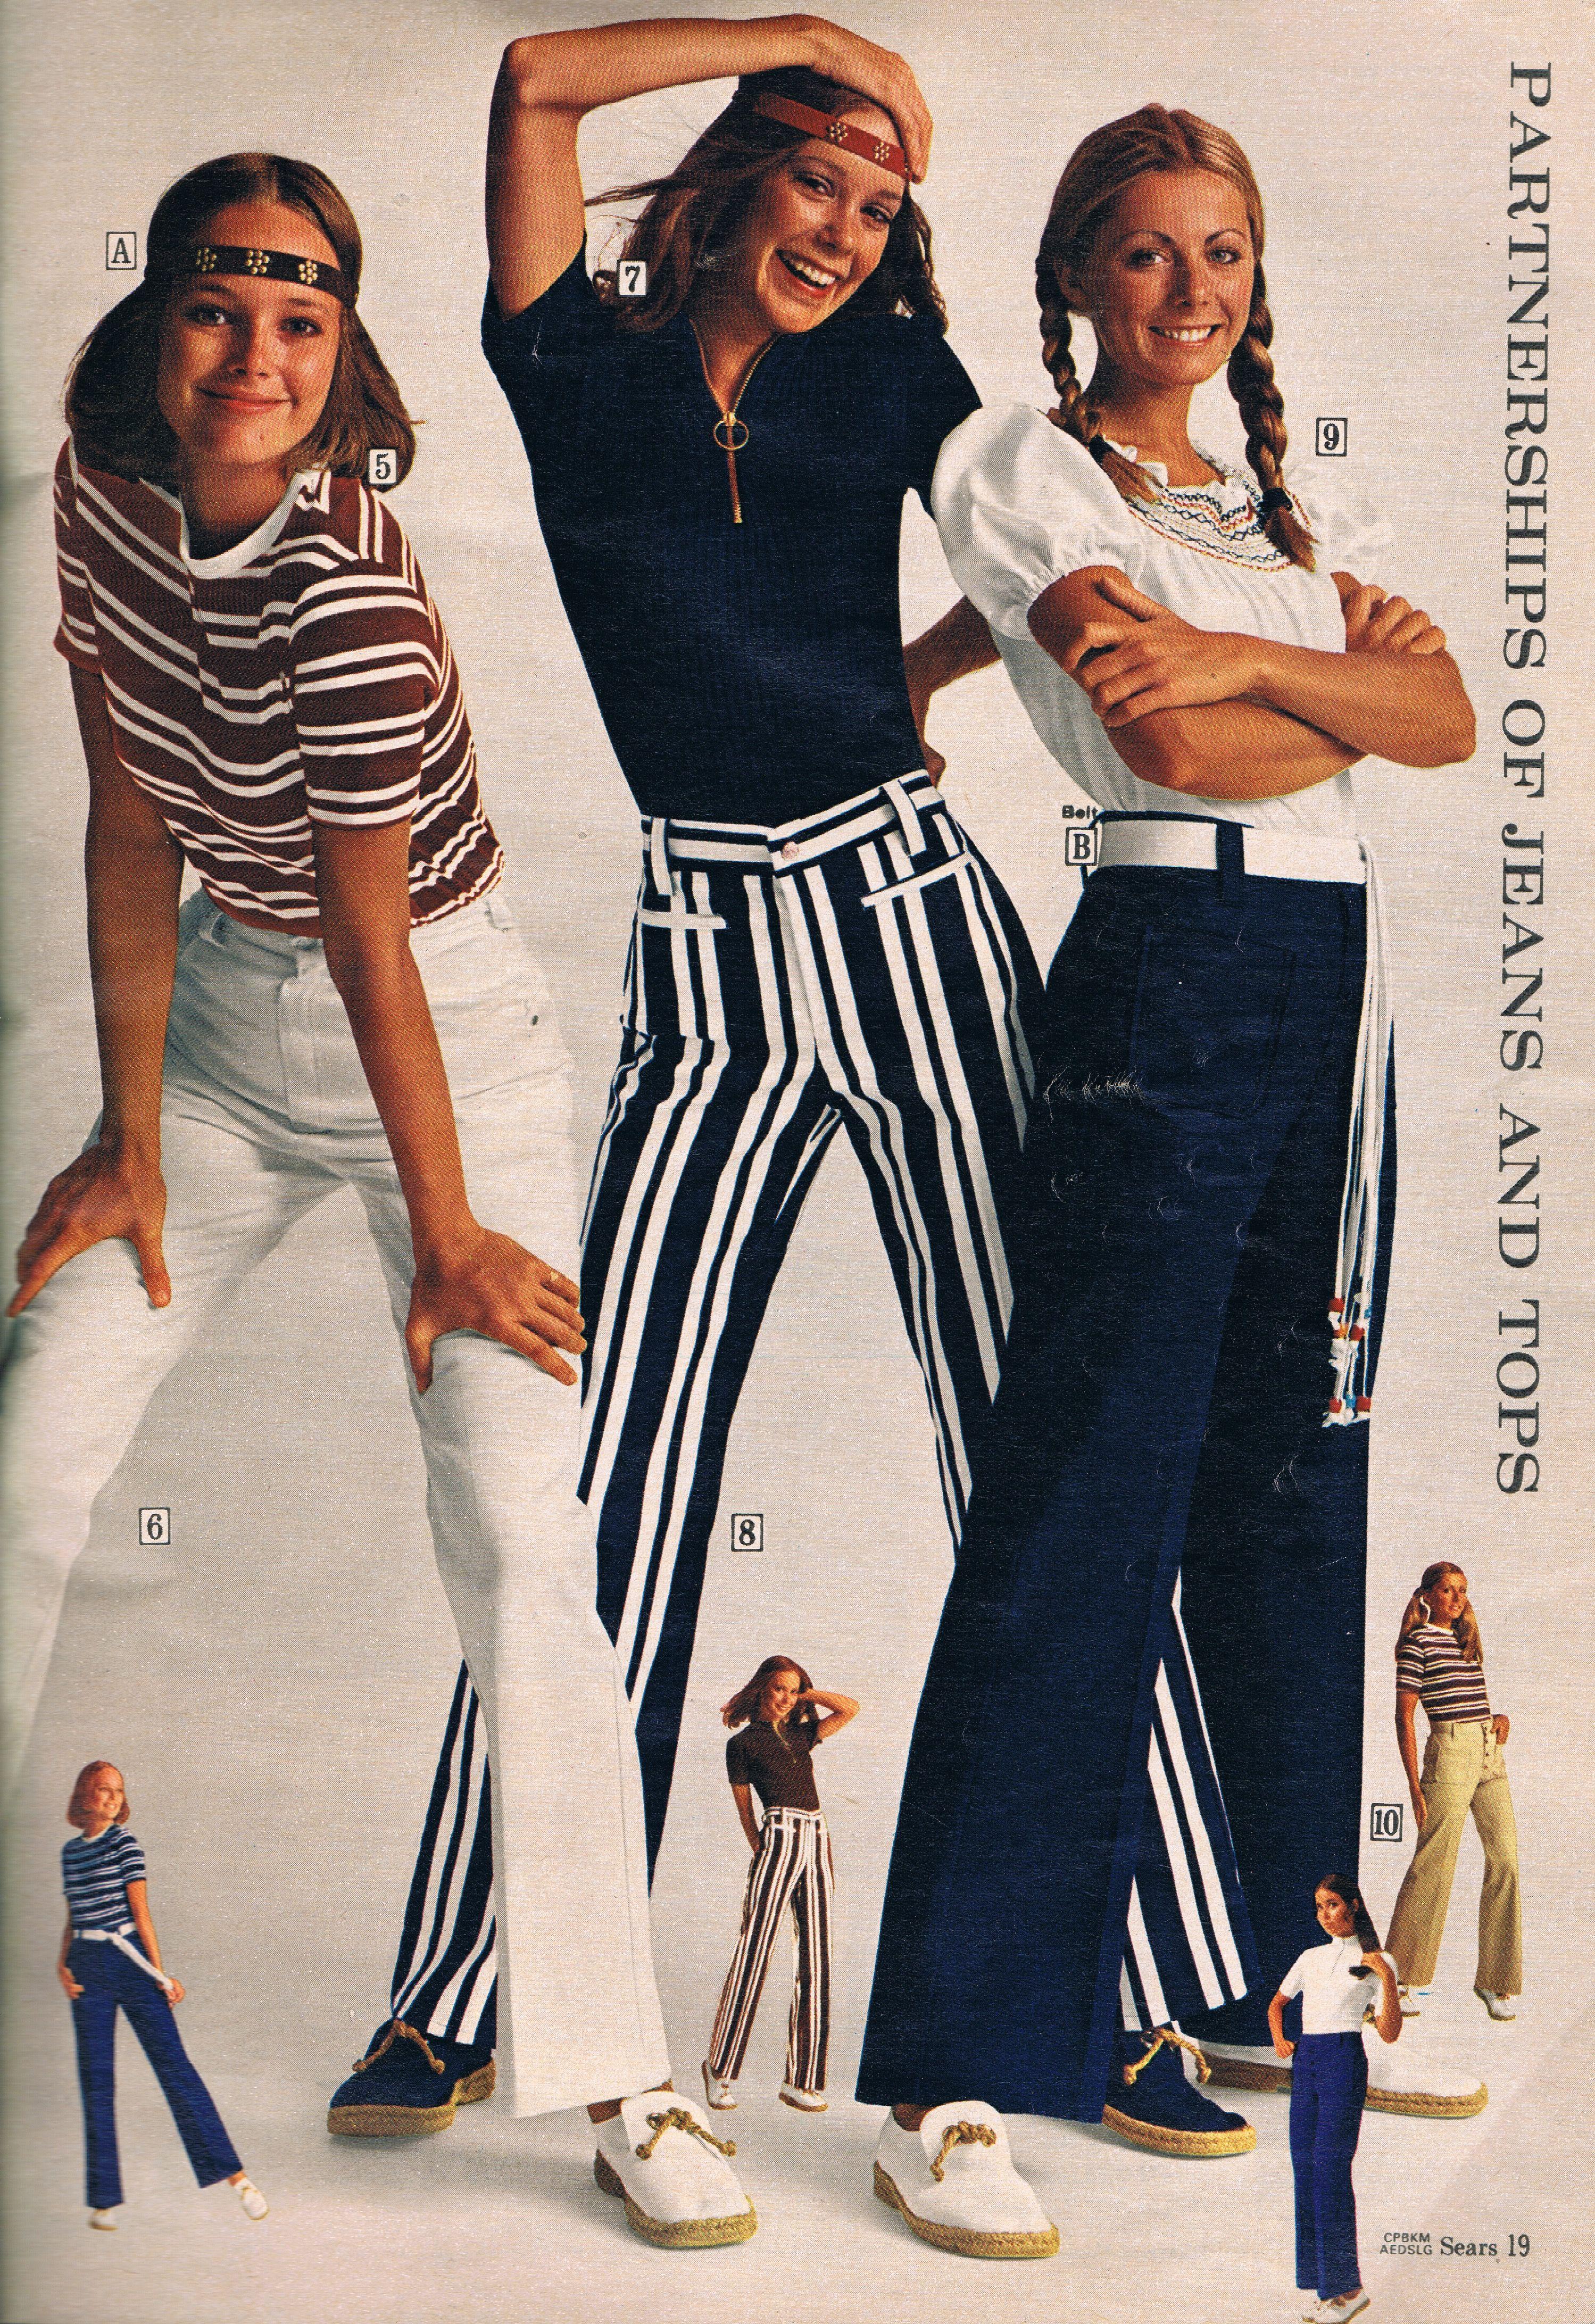 ce2b1d51341 Sears catalog 70s